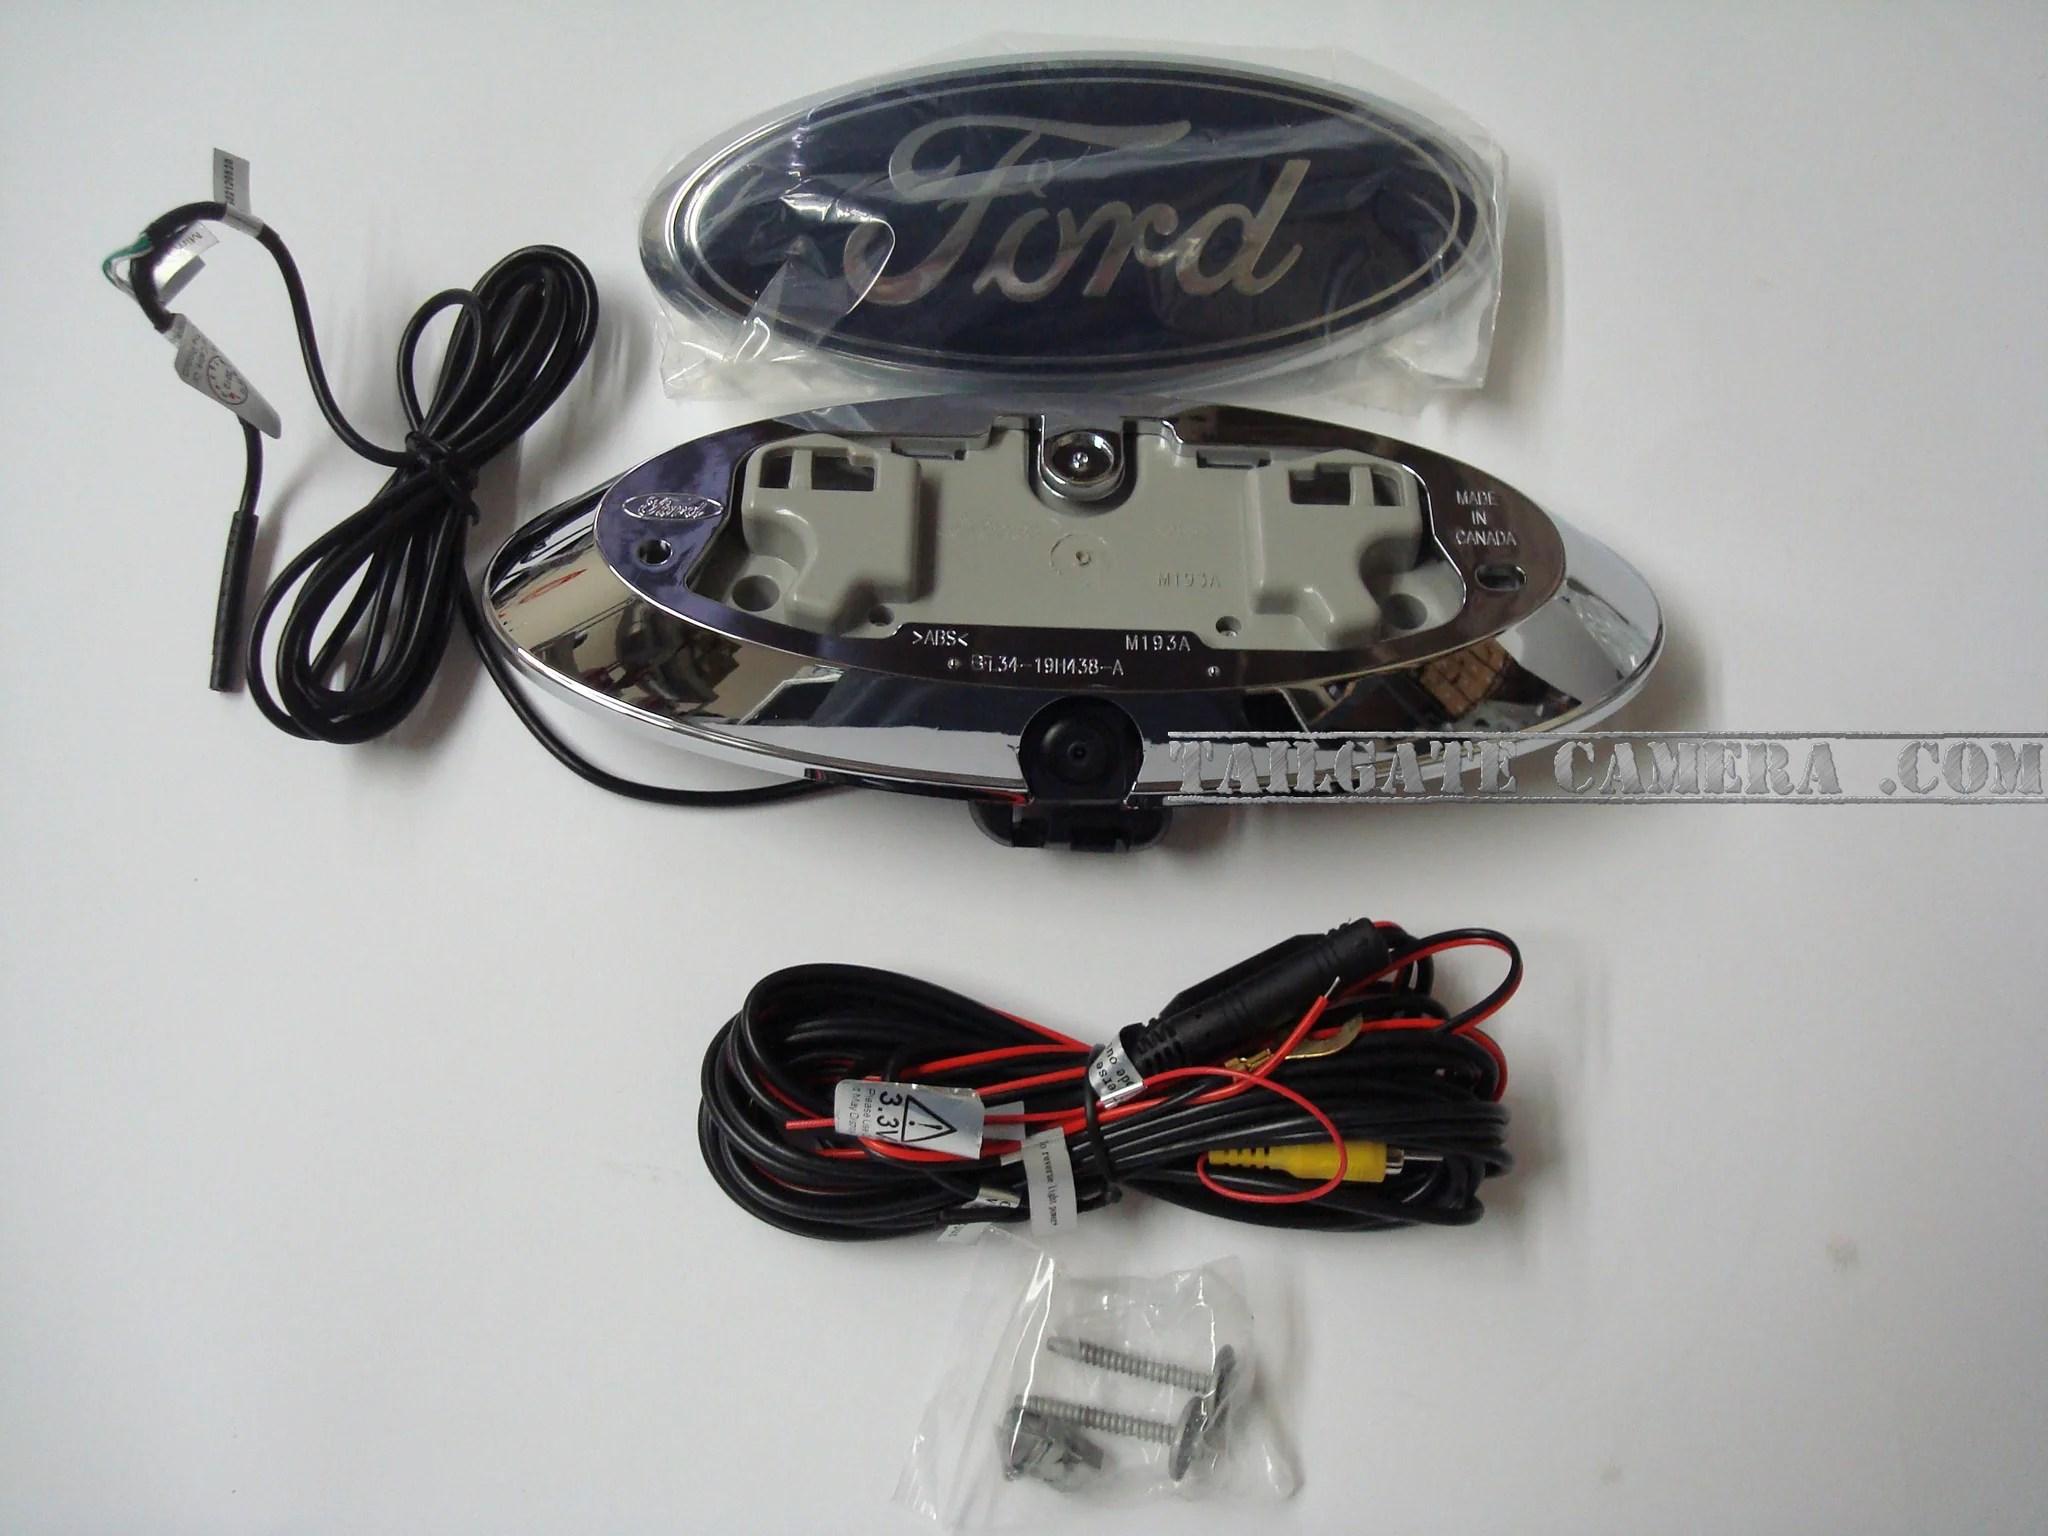 97 Ford F 350 Radio Wire Diagram Ford F150 Tailgate Emblem Camera Ford F250 Tailgate Camera